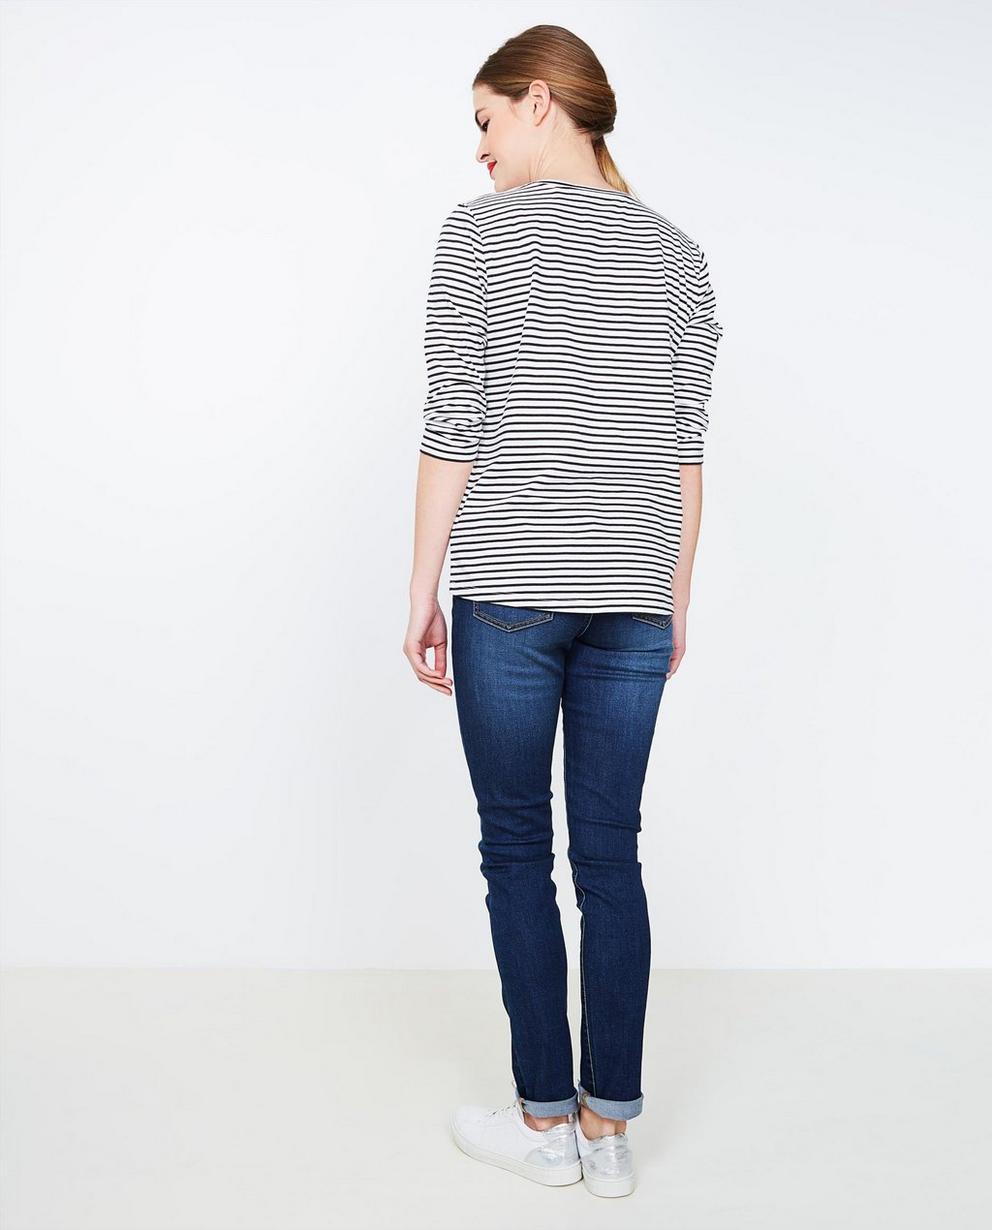 Jeans - navy - Jeans slim bleu foncé